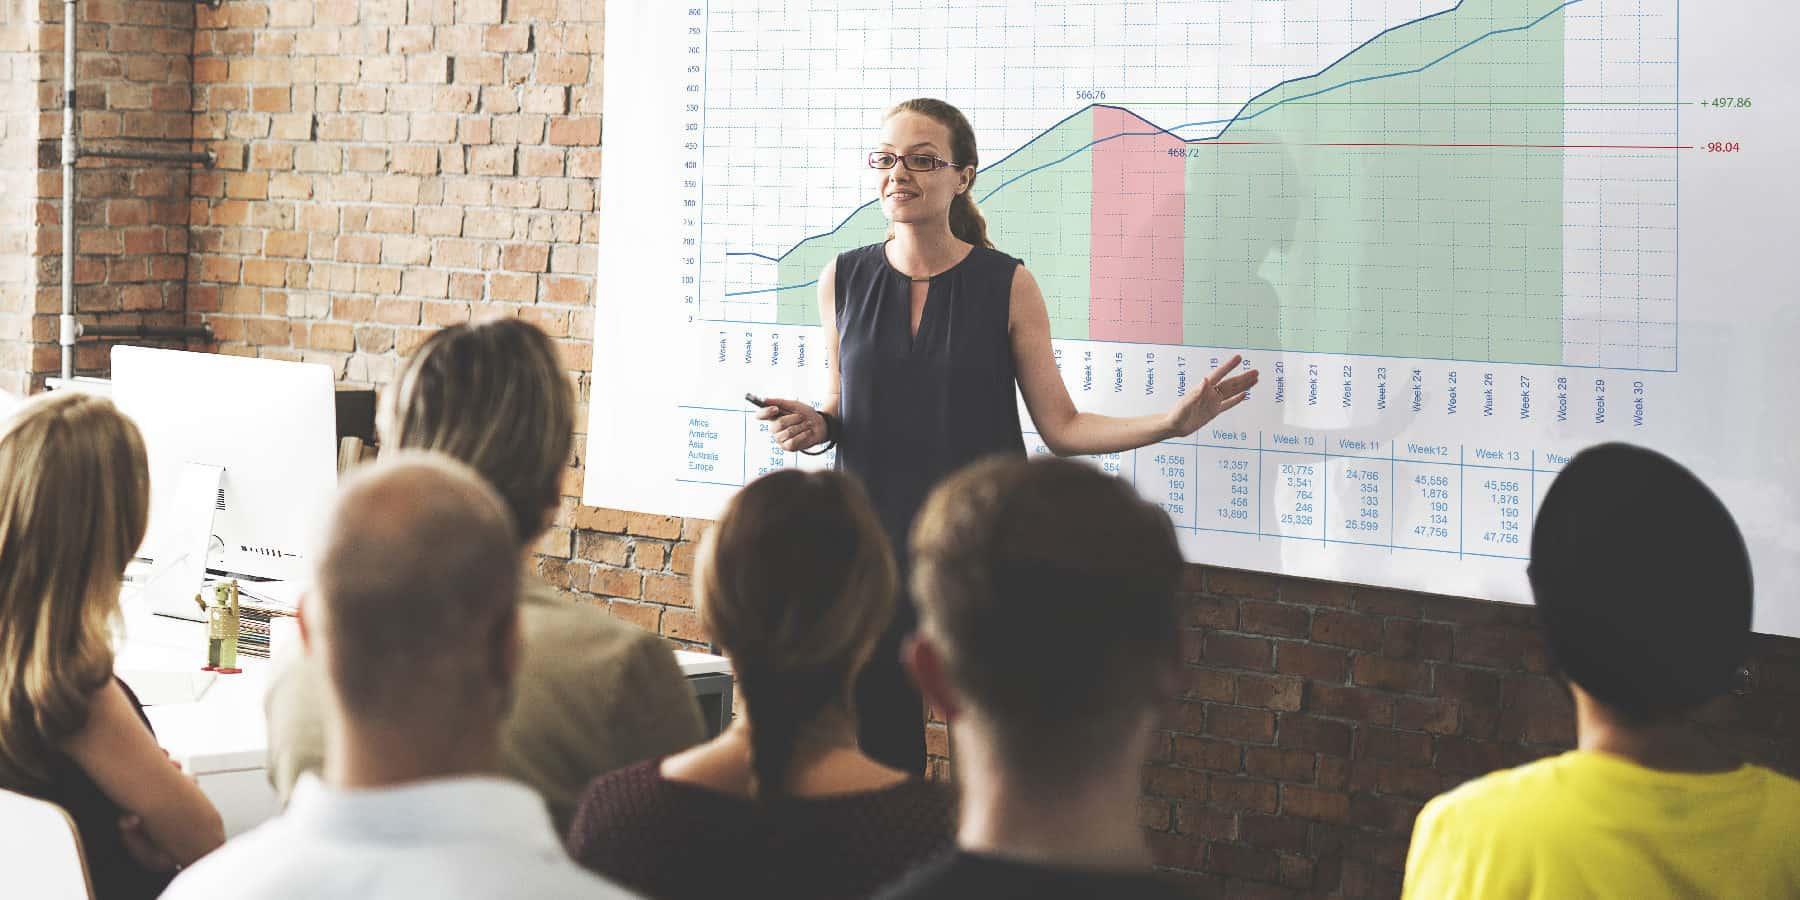 Understanding Customer Service Data